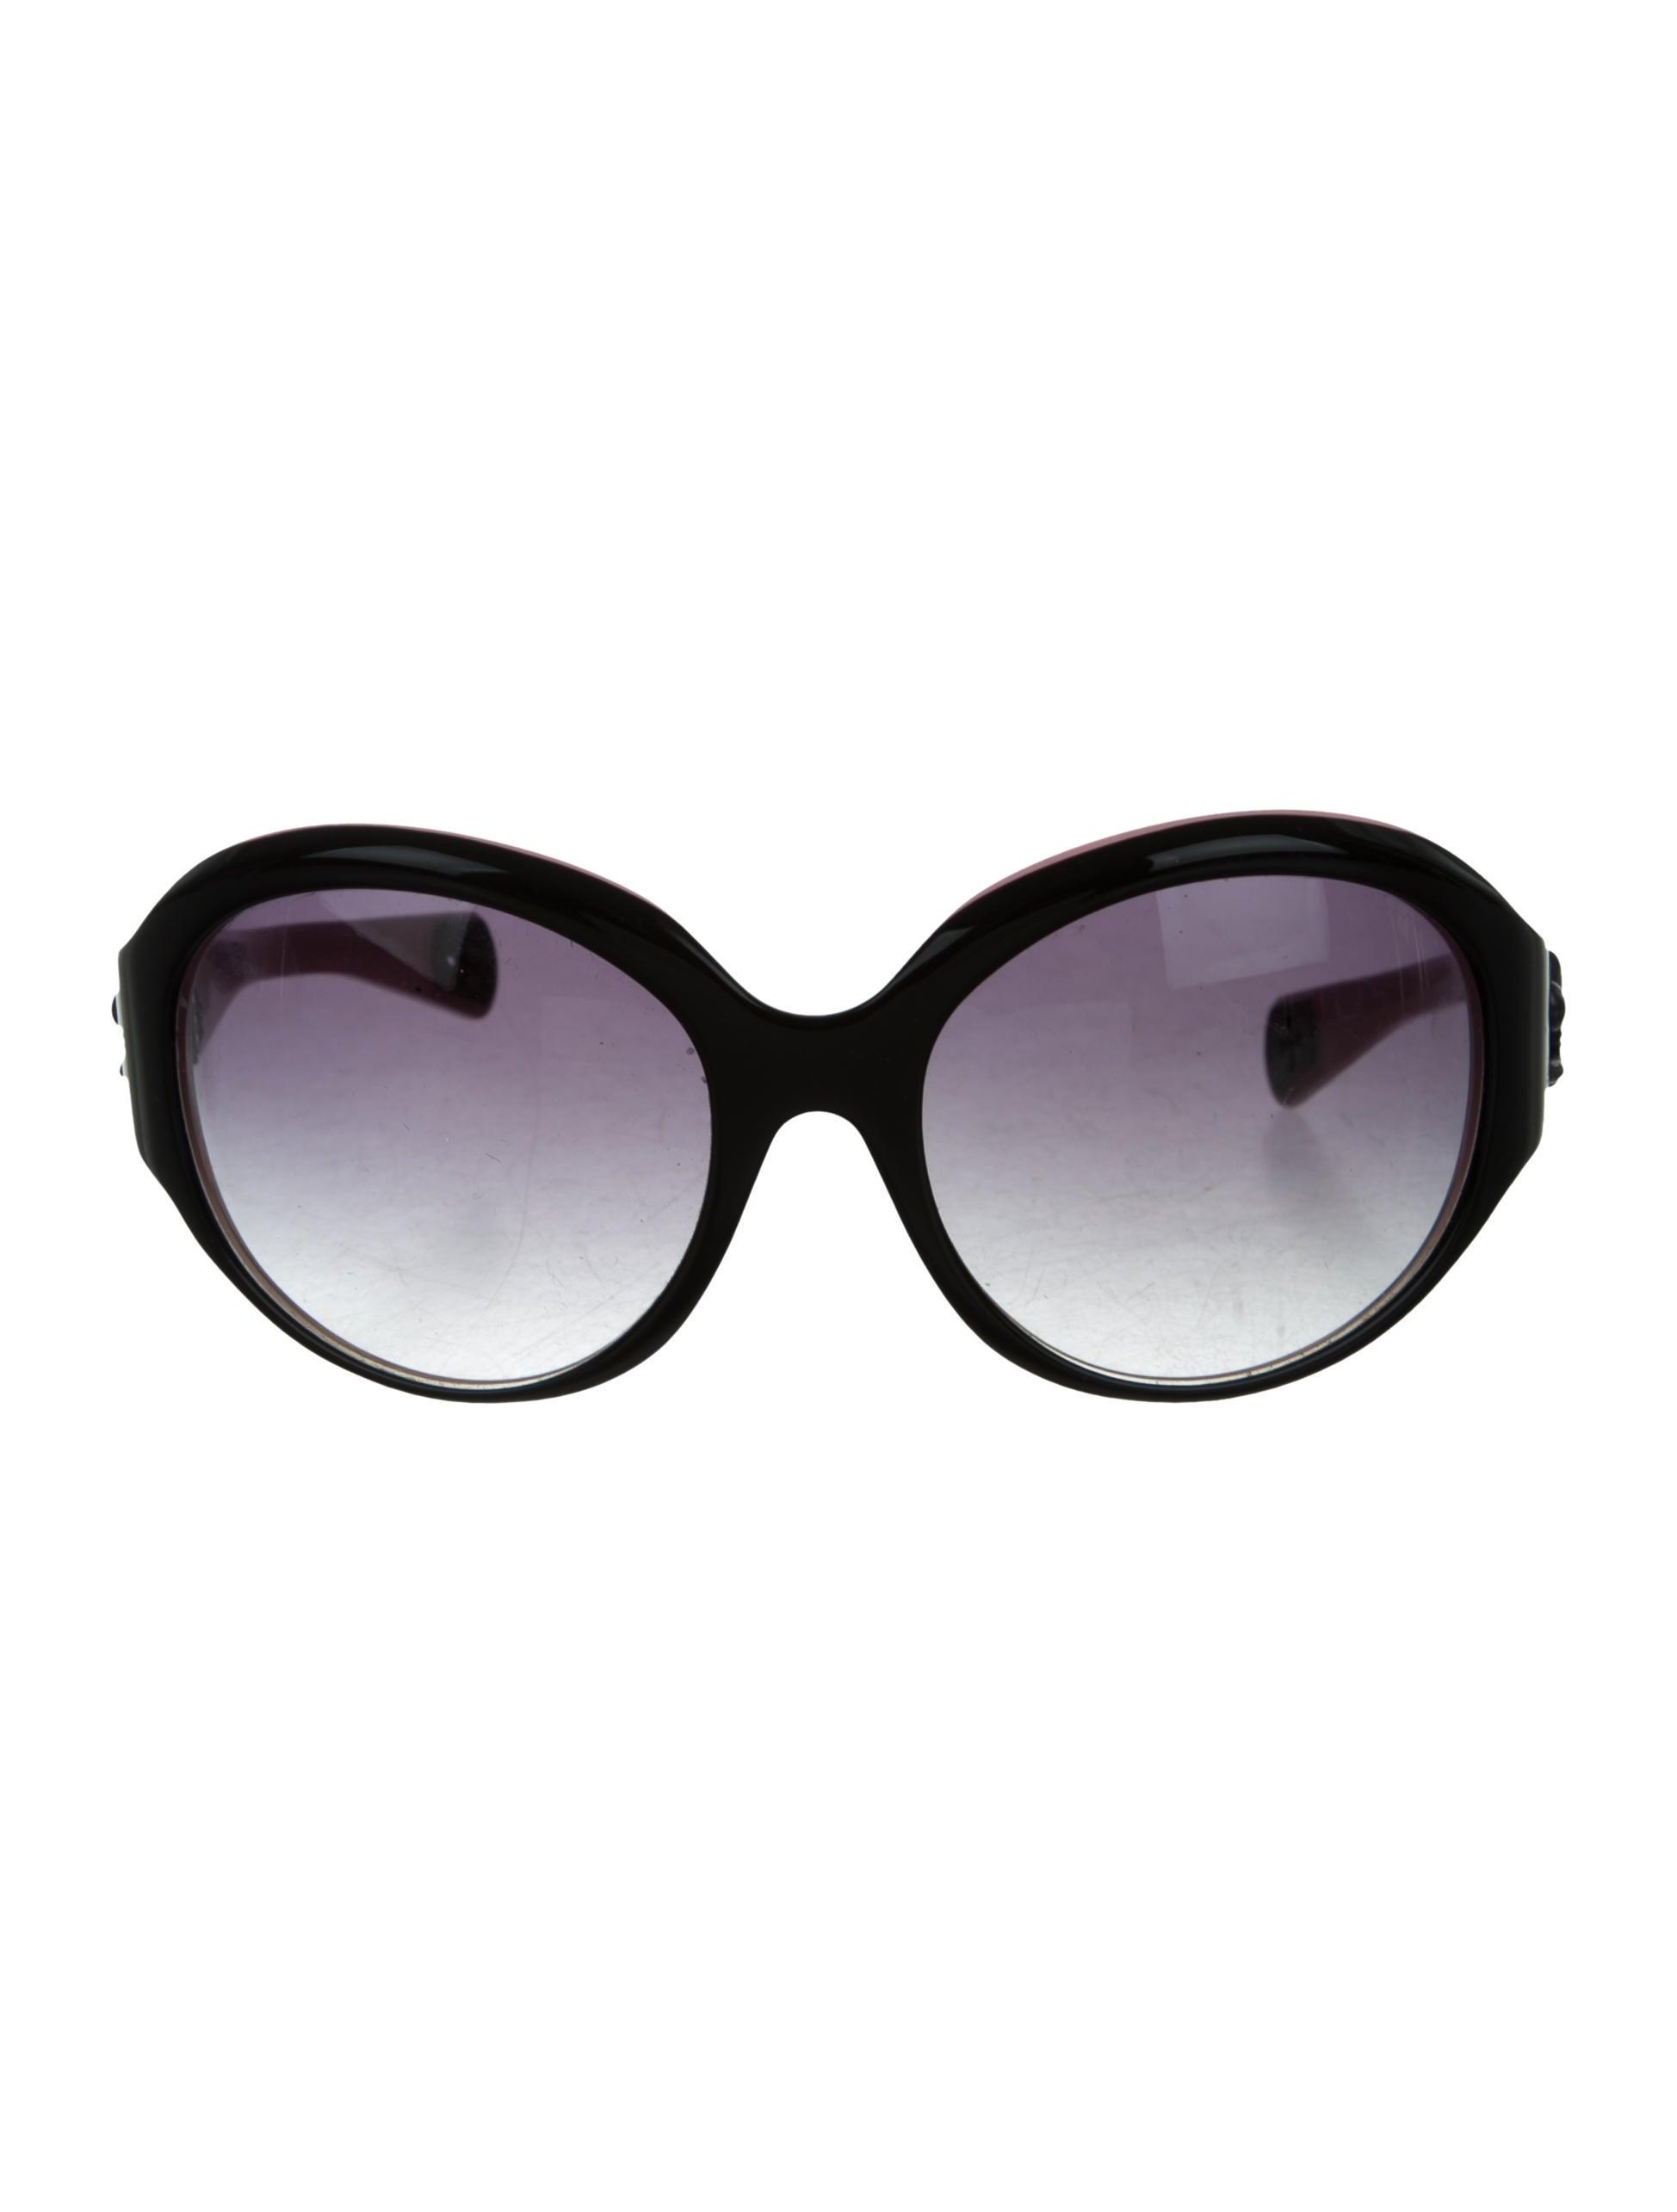 9ee6123b13c0 Chrome Hearts Sunglasses Near Me